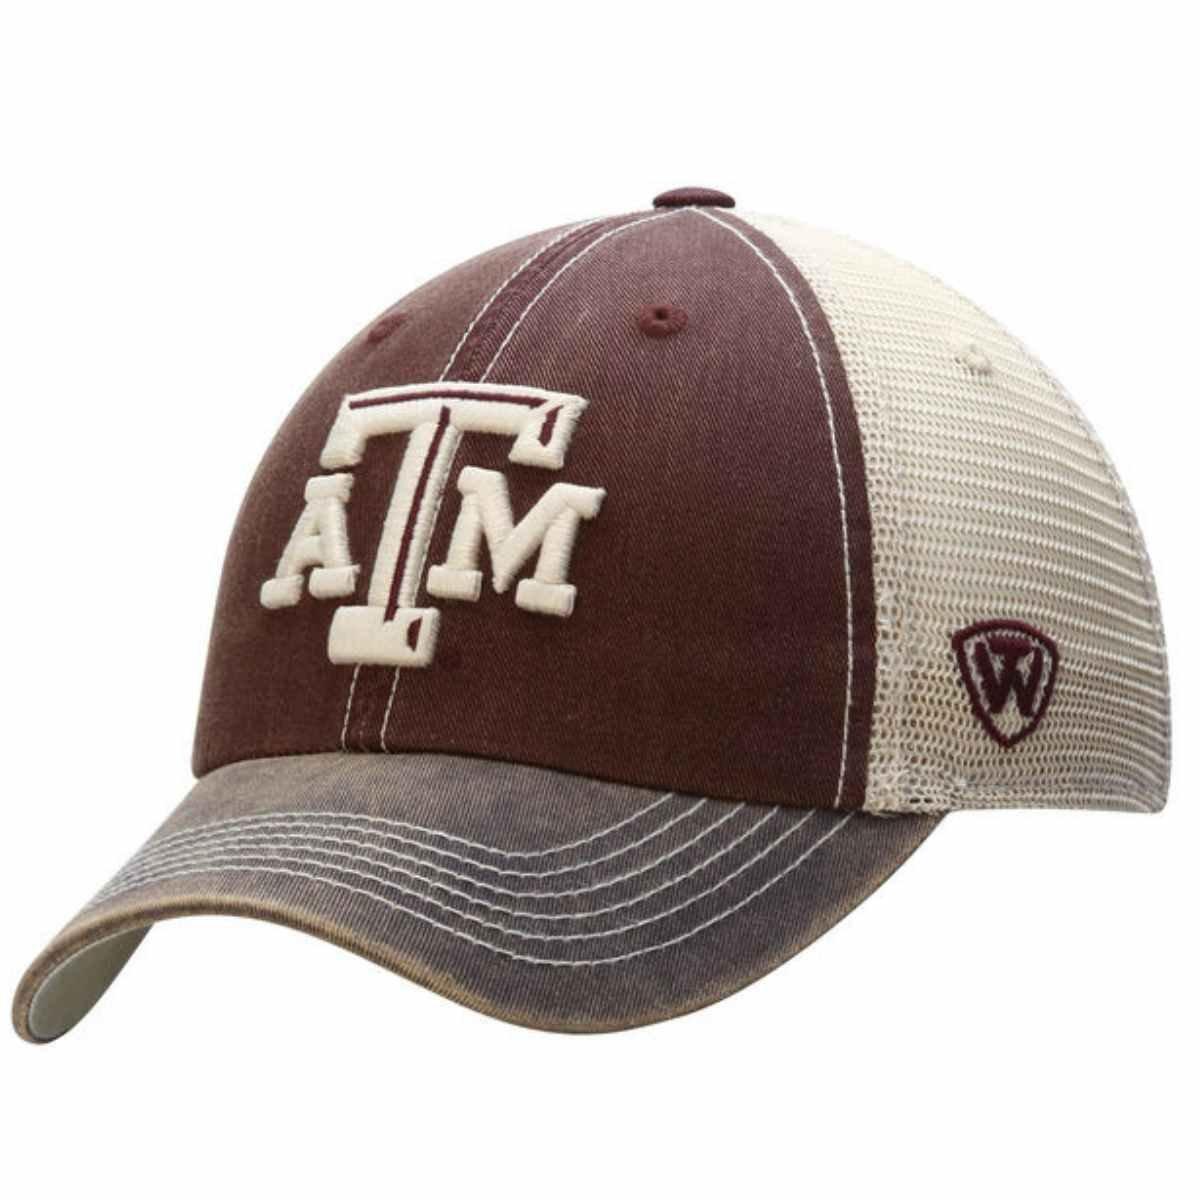 Texas A & M Aggies Top of the World MaroonグレーオフロードAdjスナップバック帽子キャップ B012EHGE6A